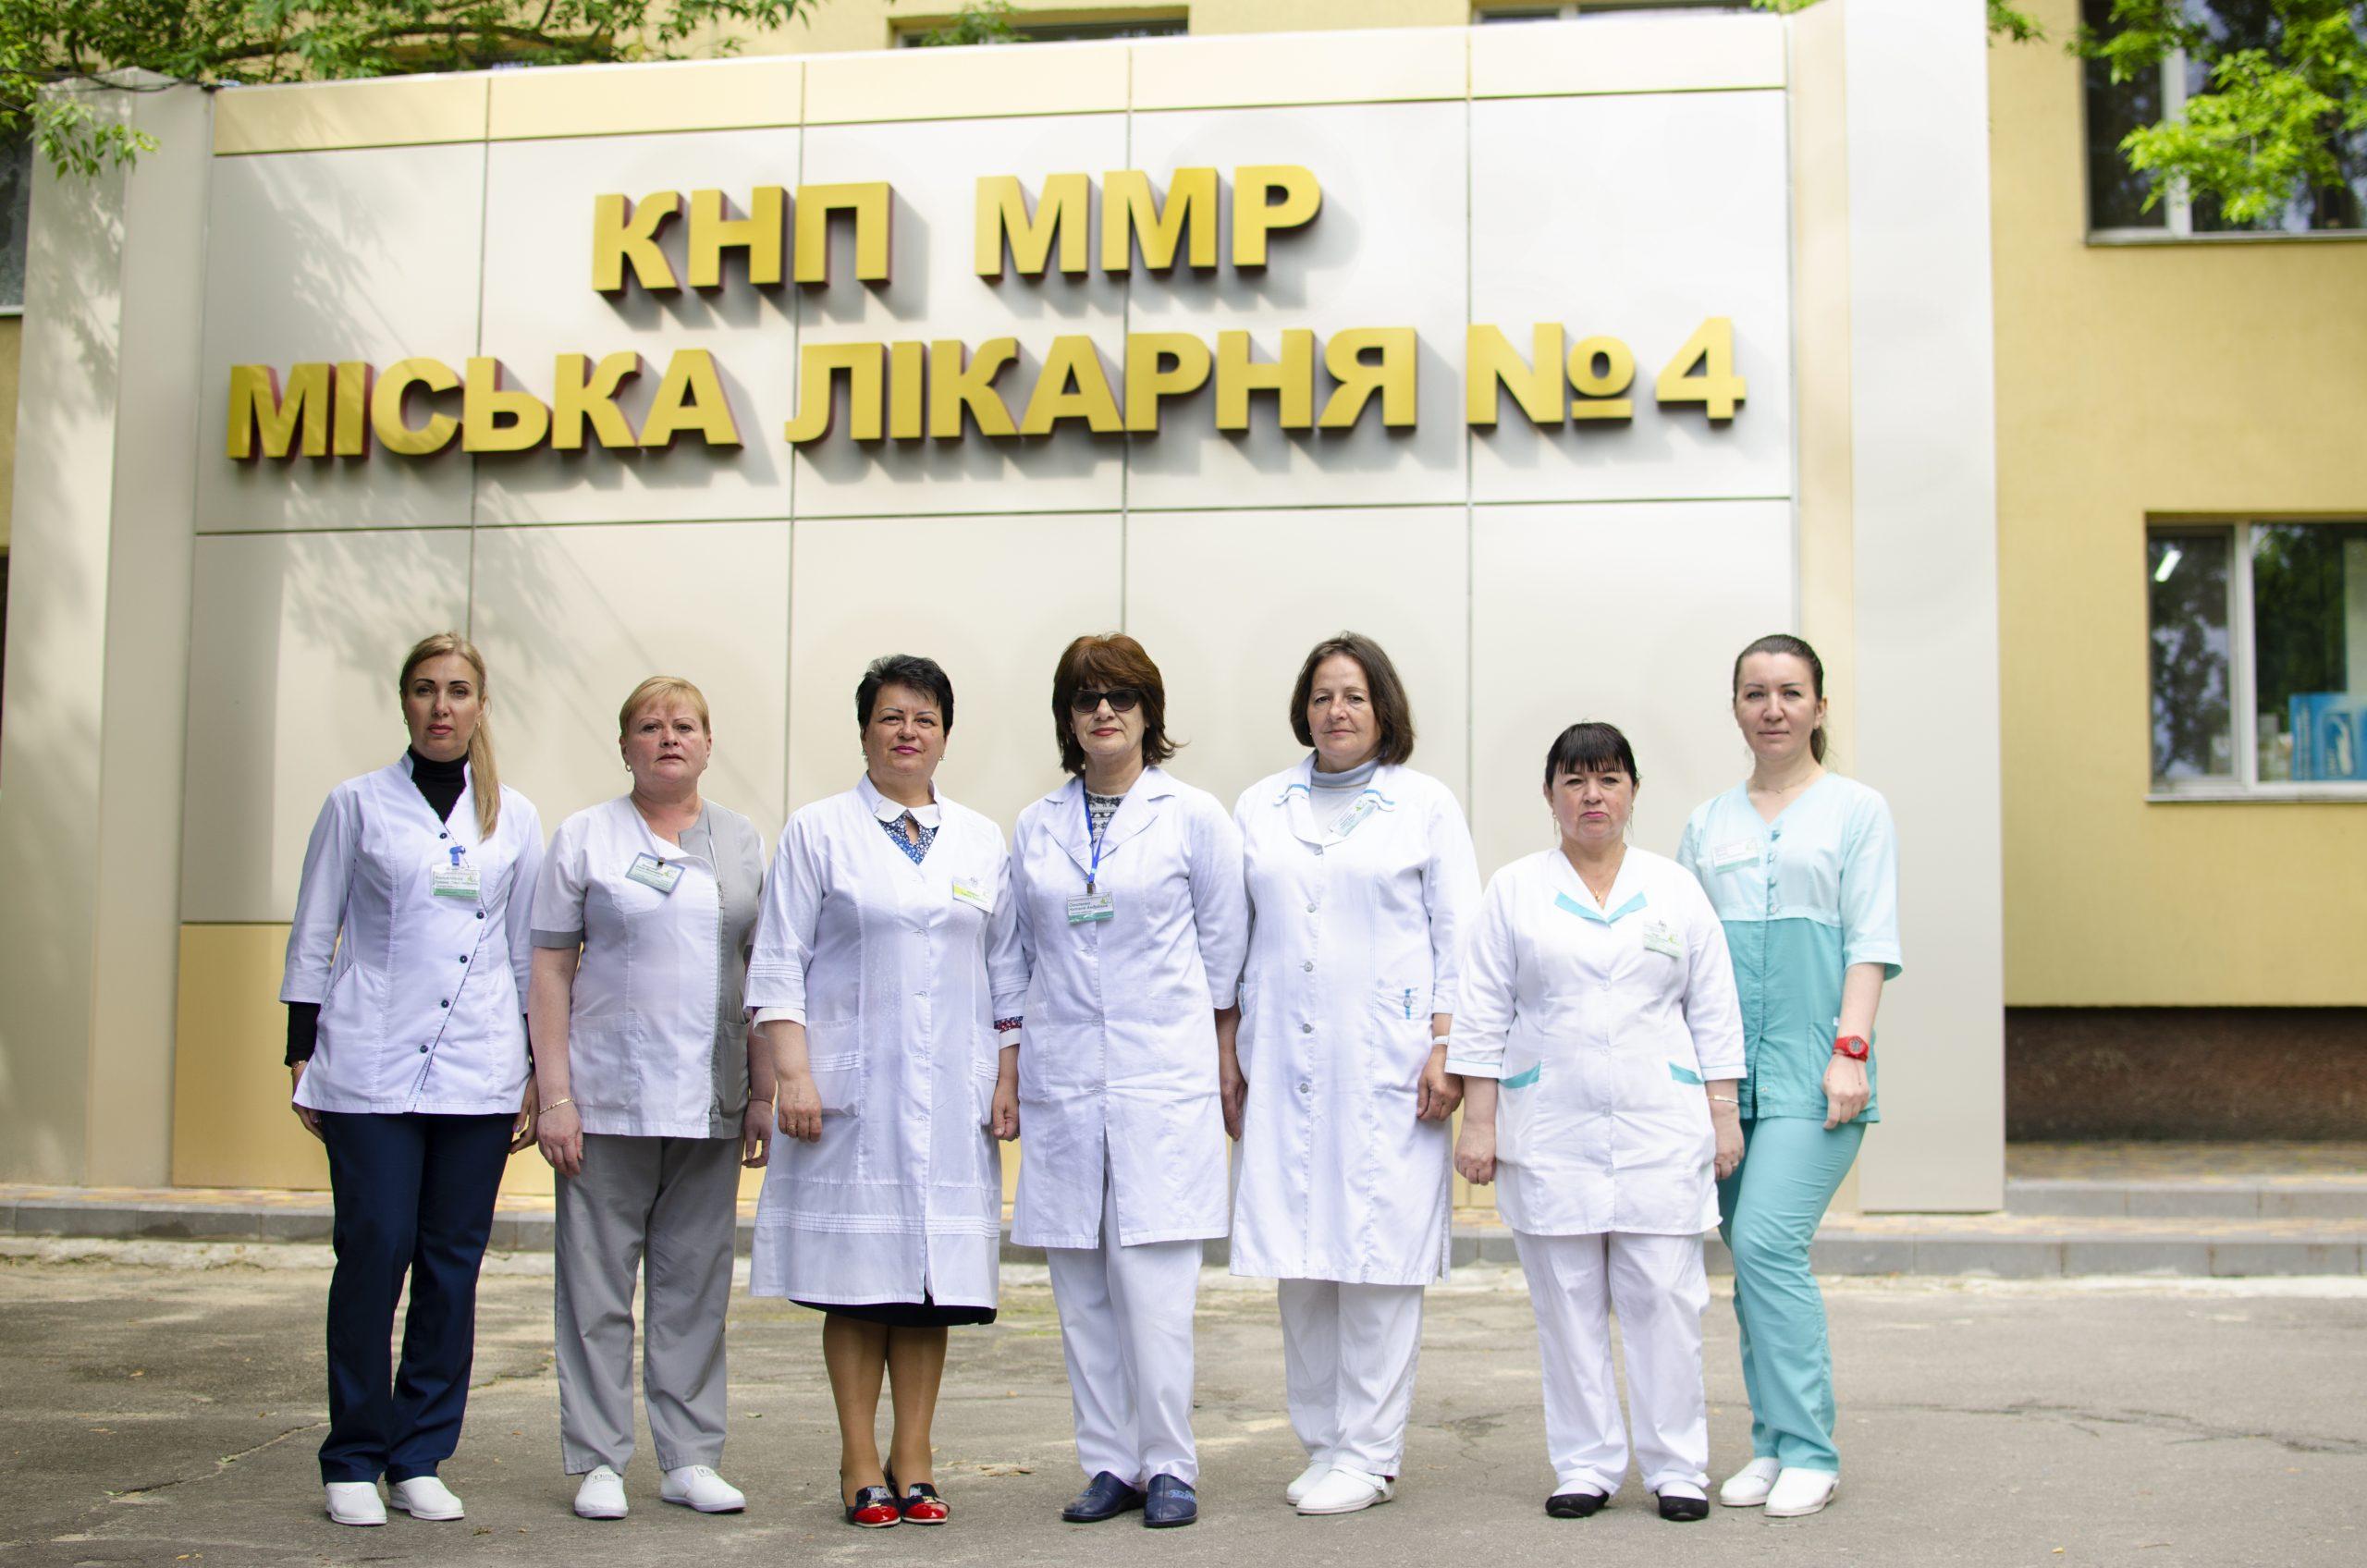 http://lik4.mk.ua/wp-content/uploads/2021/07/PHO_1490я-scaled.jpg